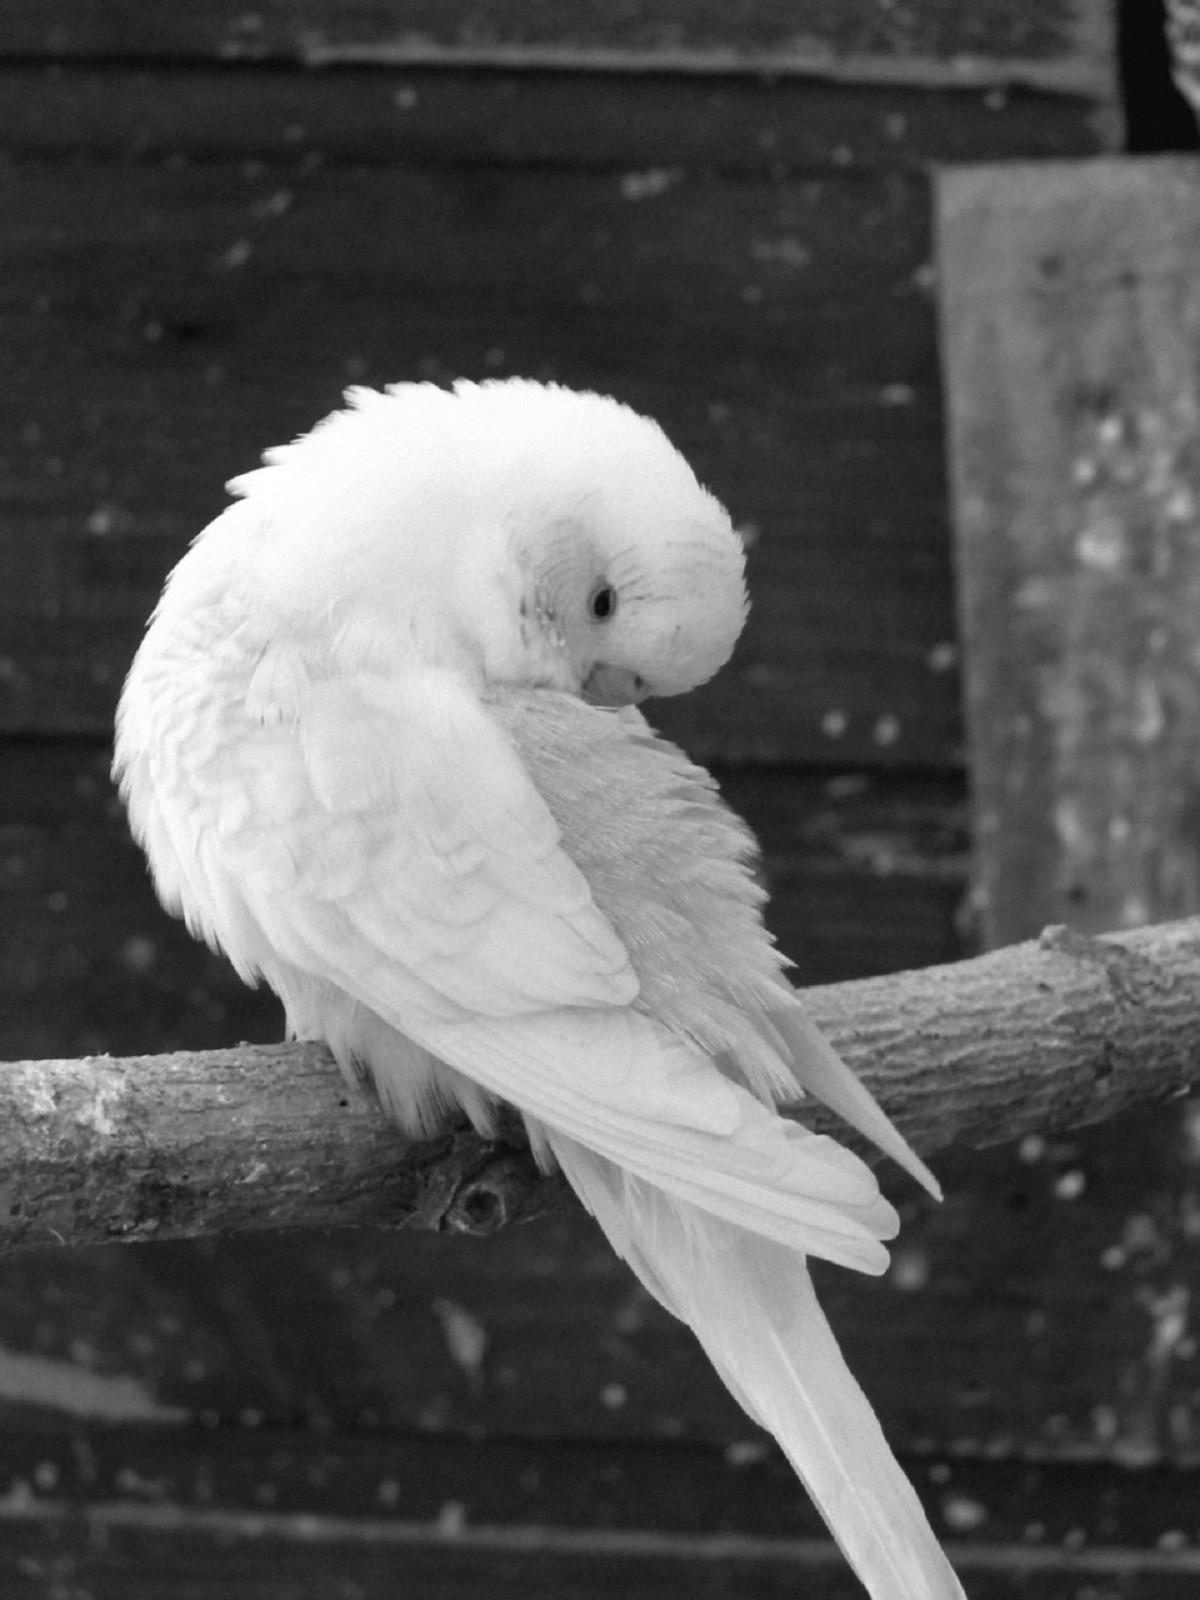 Free Images Wing Black And White Beak Toilet Blue Rest Fauna Birds Sleep Vertebrate